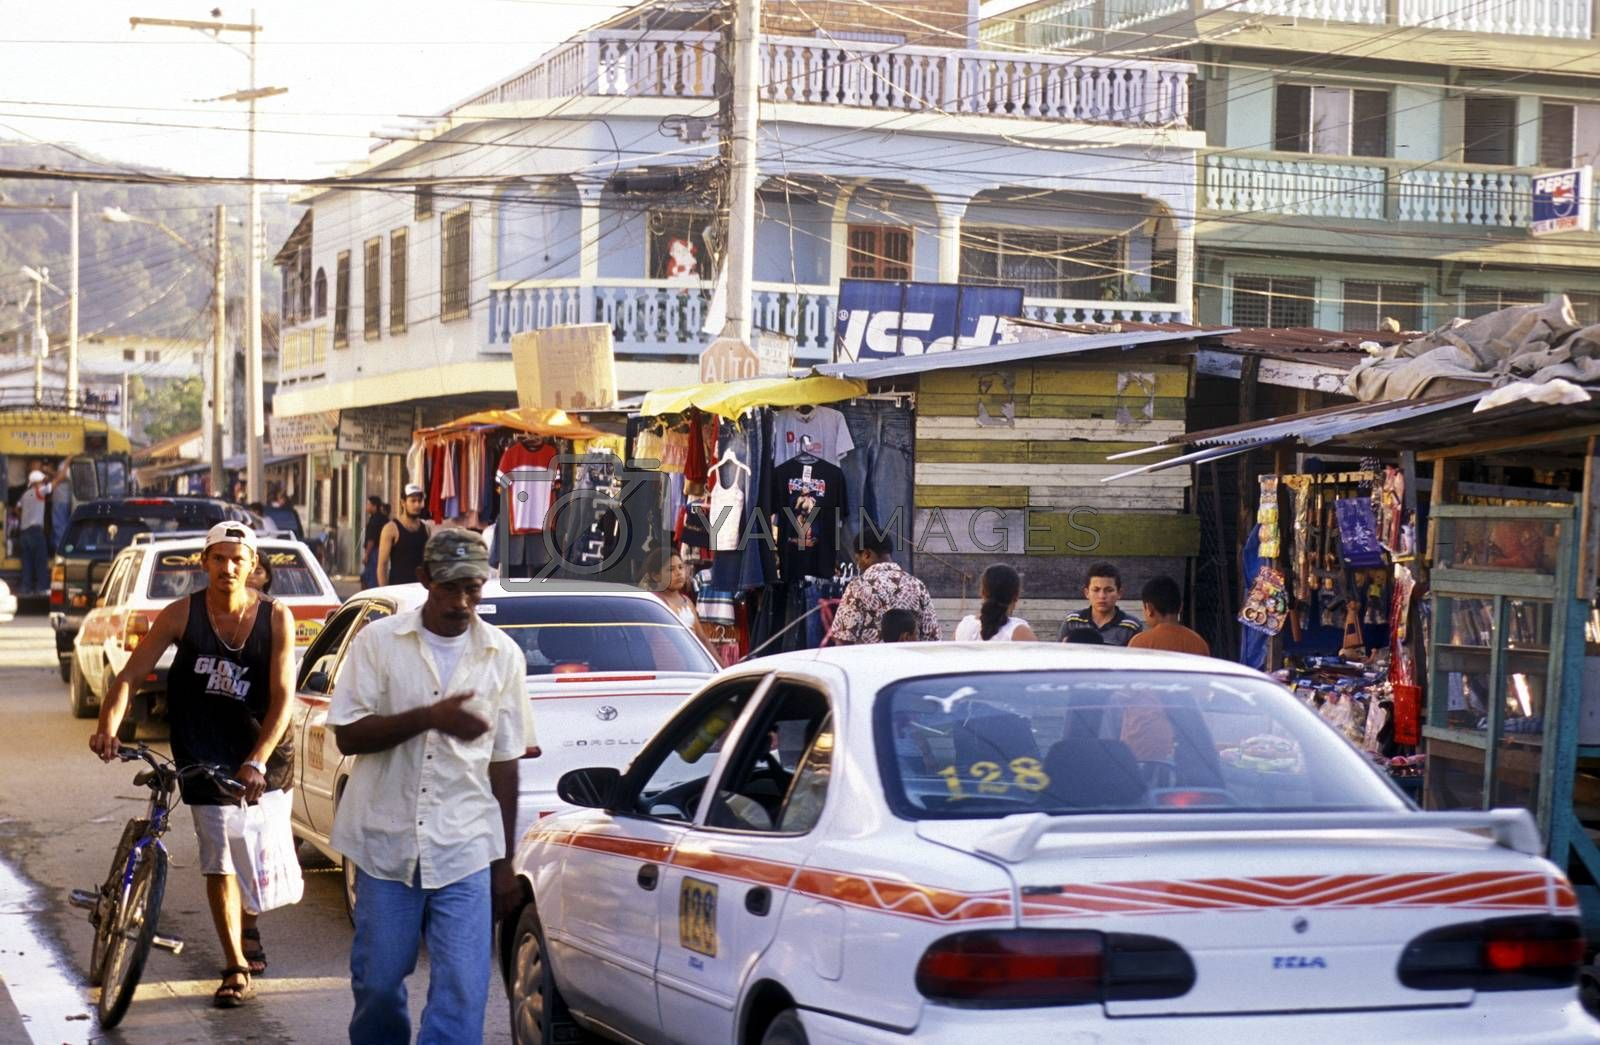 the city of Tela near San Pedro Sula on the caribian sea in Honduras in Central America,